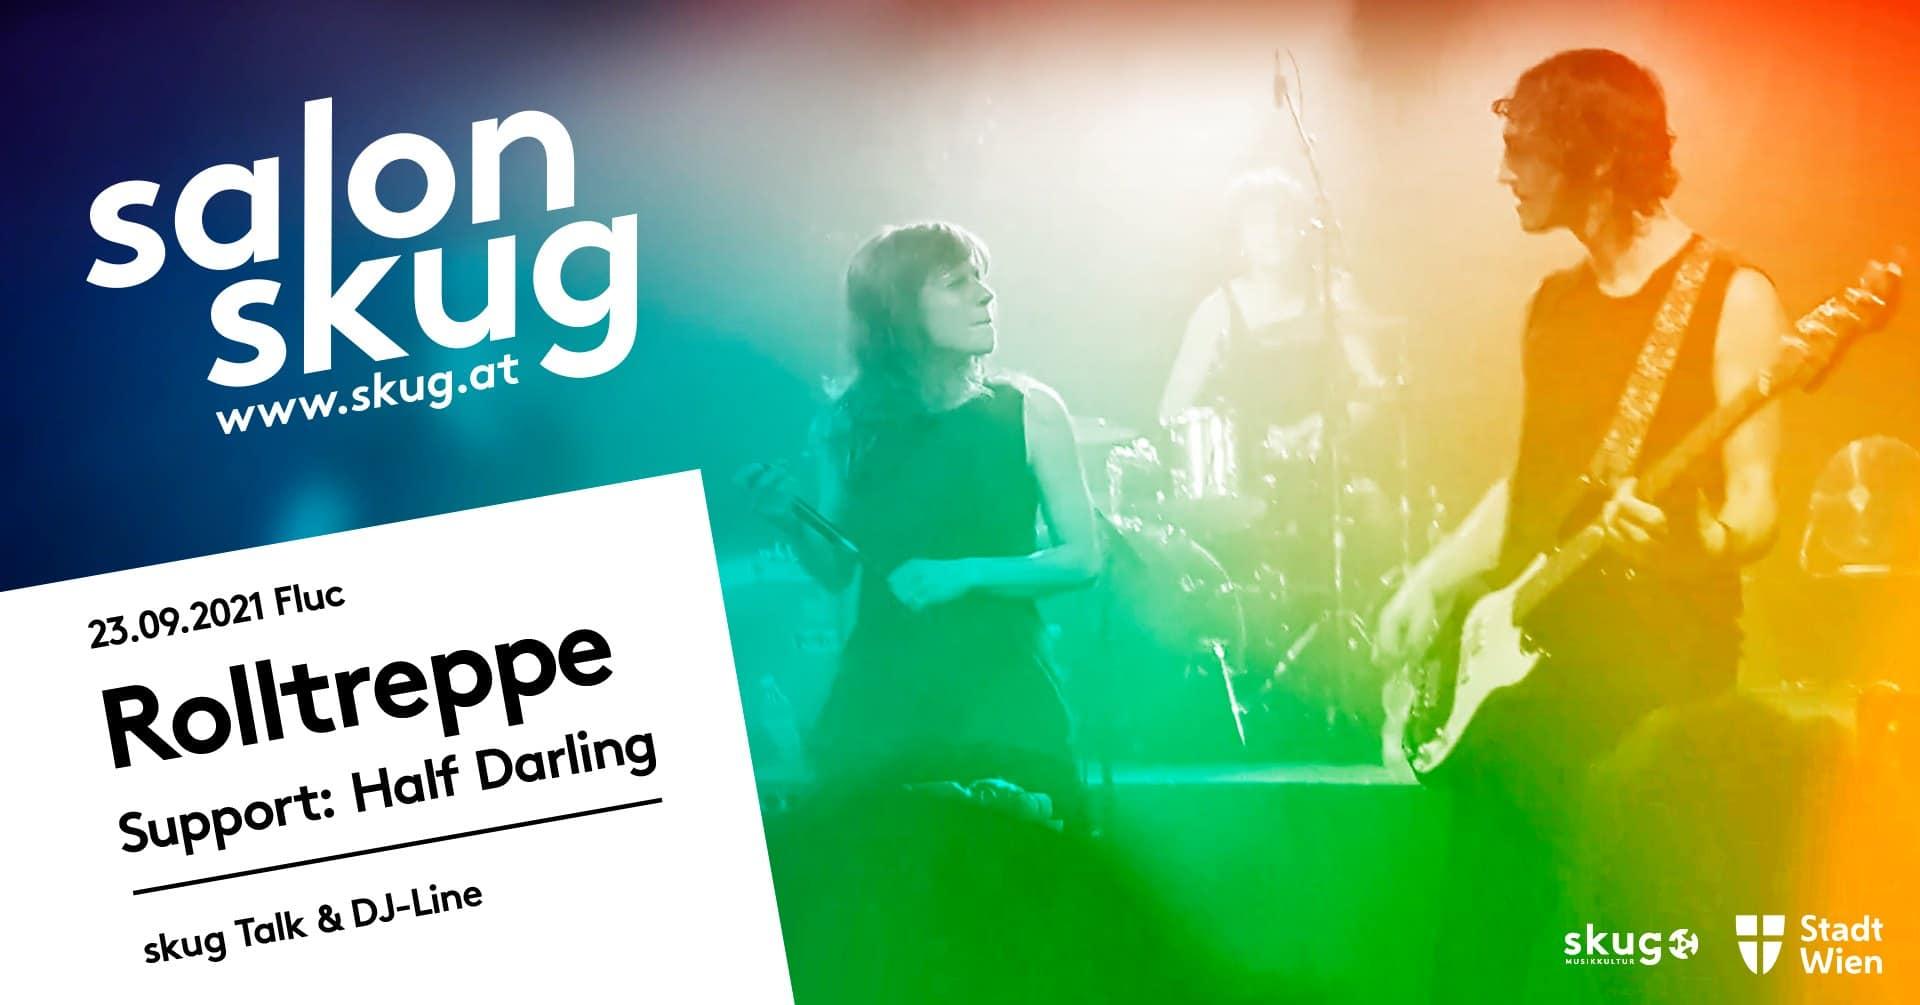 Events Wien: Salon skug: Rolltreppe / Half Darling